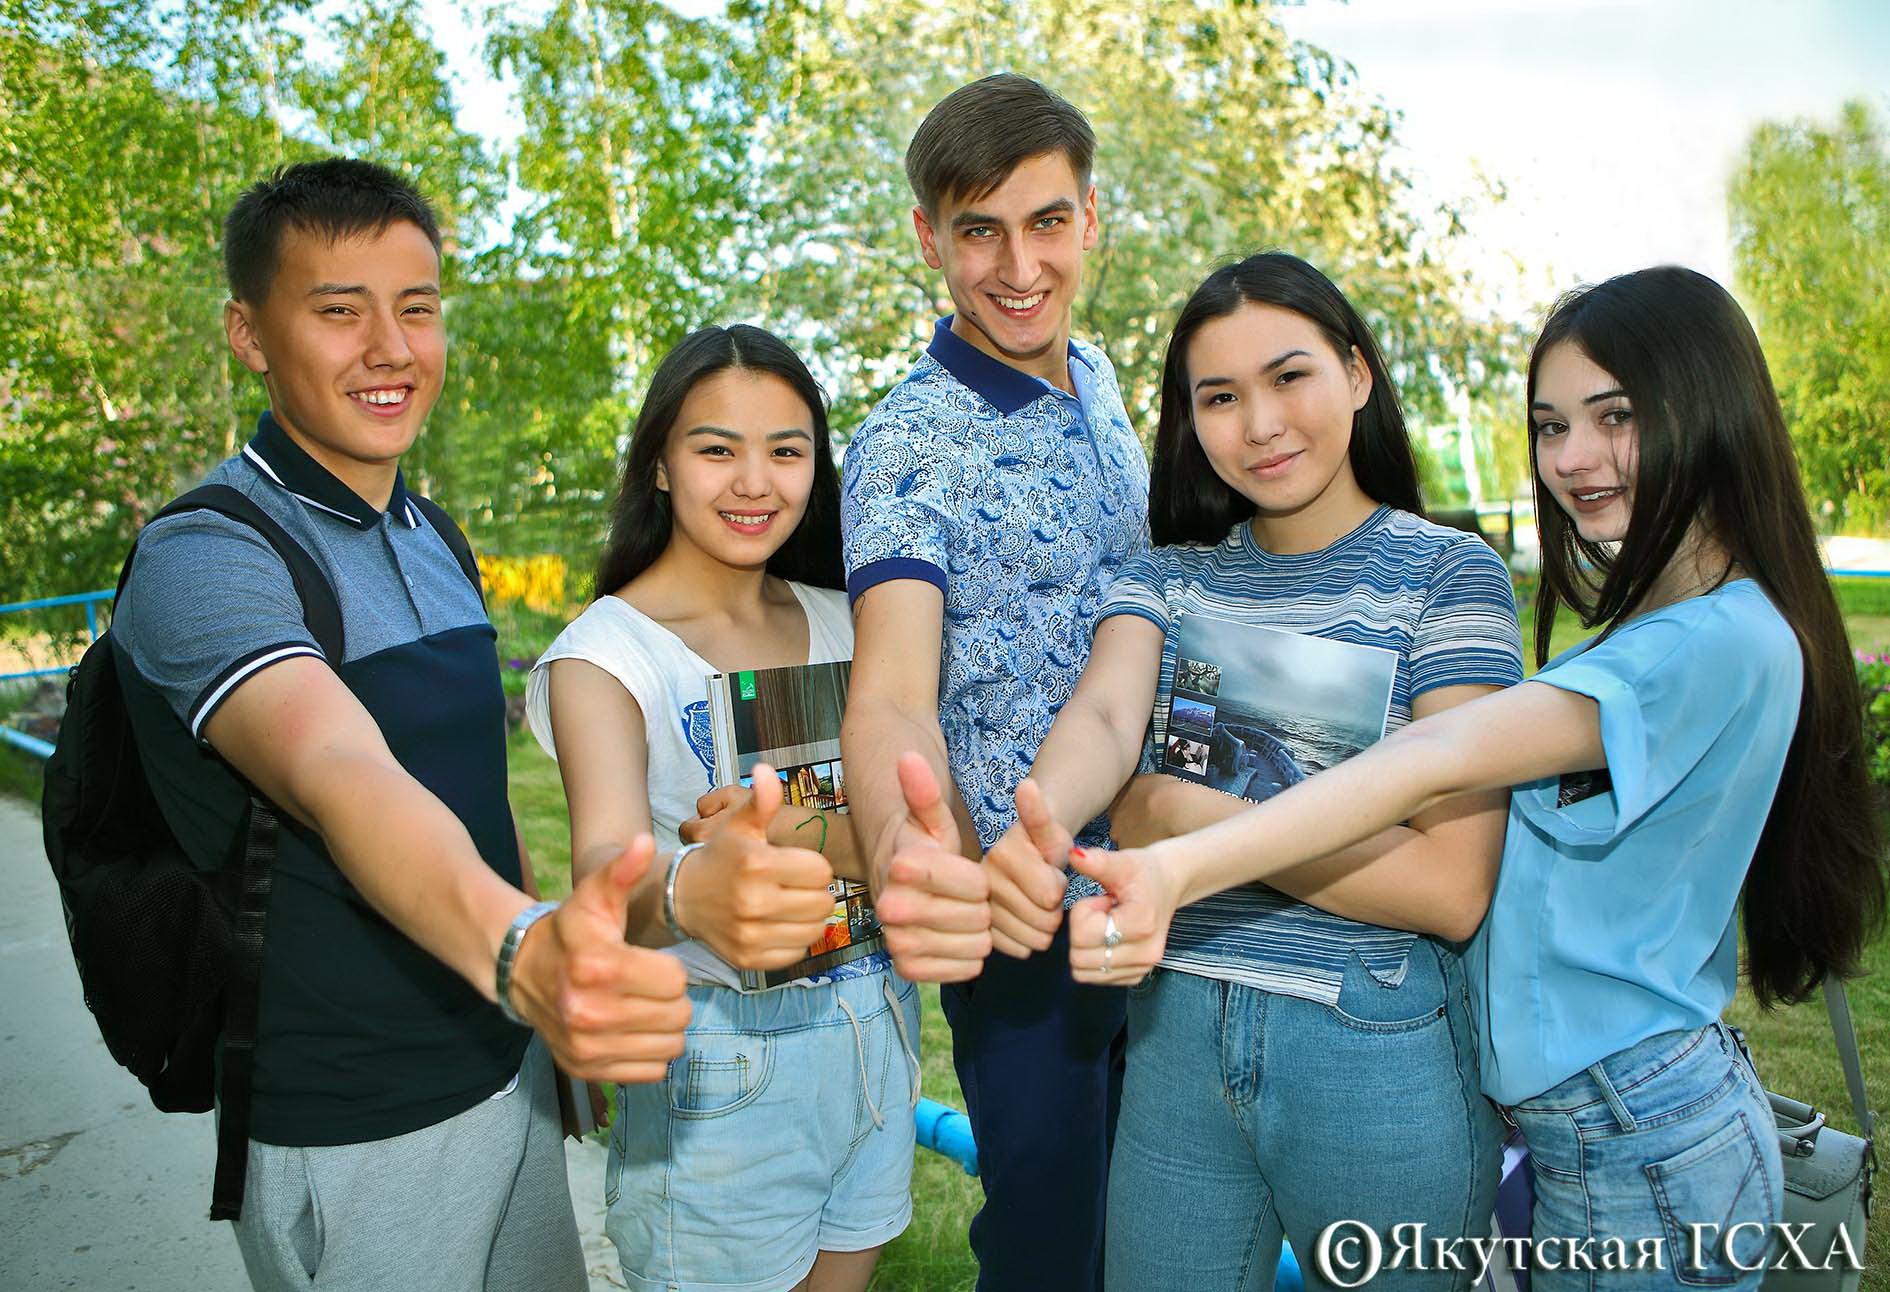 Последняя волна приема абитуриентов в Якутской ГСХА